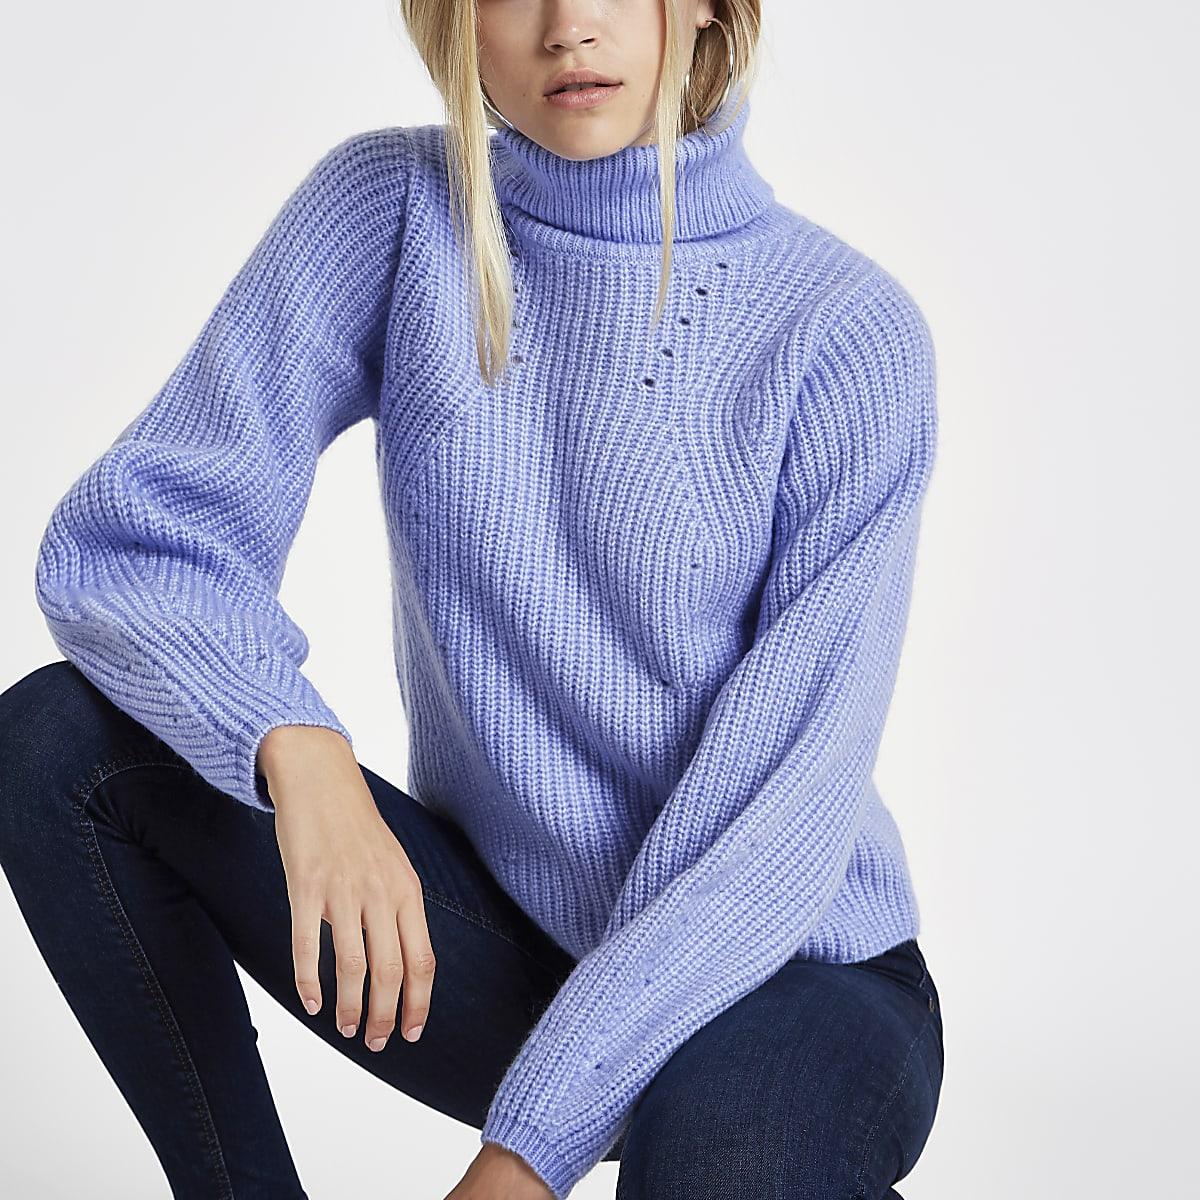 Light blue knitted roll neck jumper